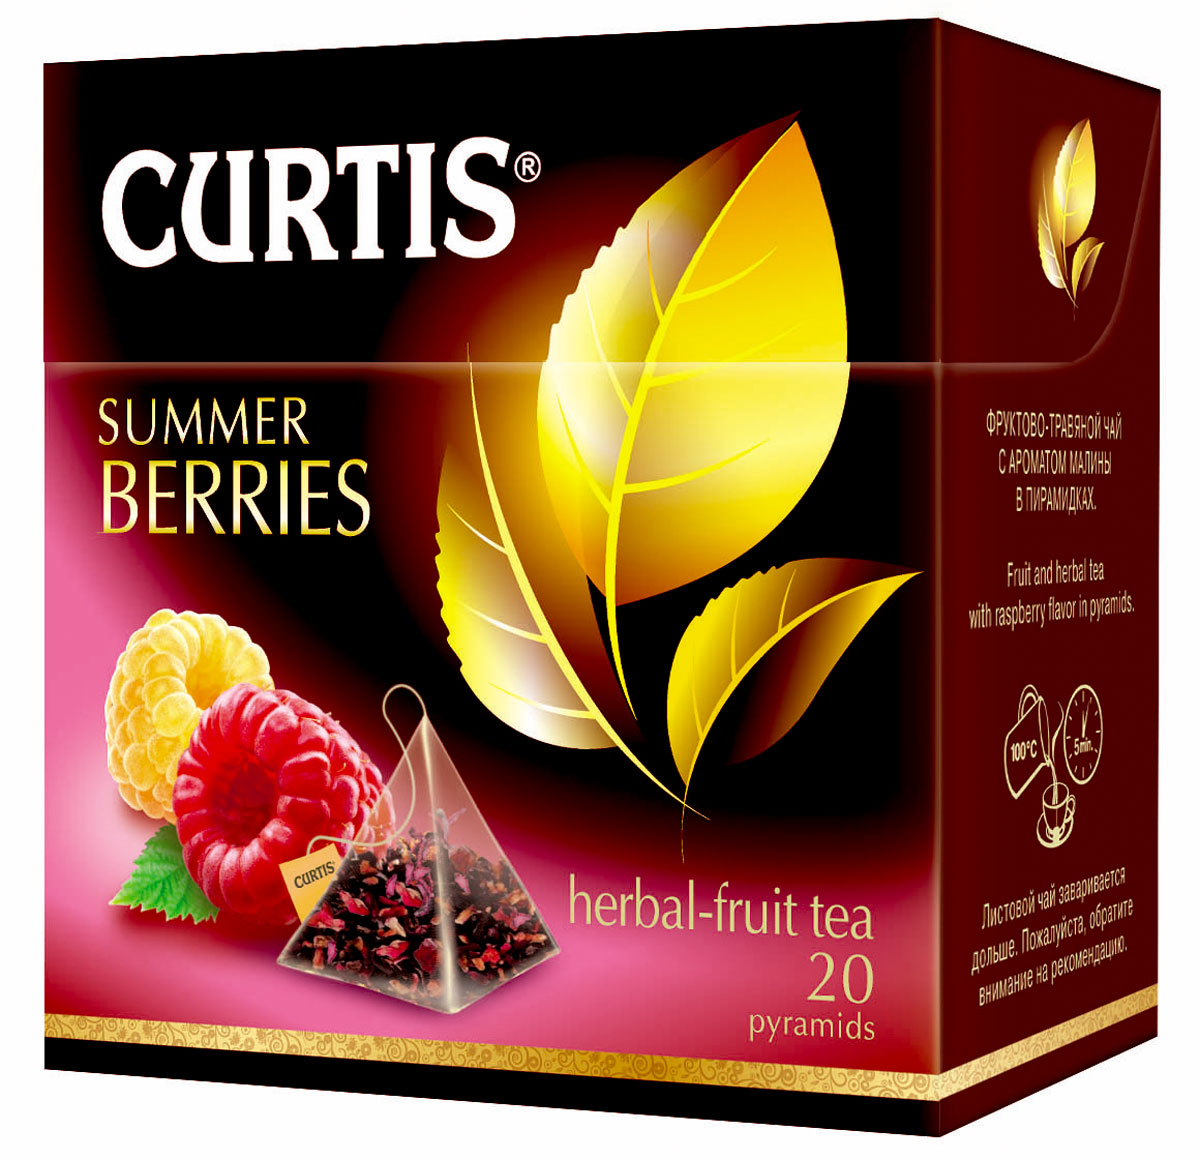 Curtis Summer Berries травяной чай в пакетиках, 20 шт алтэя чайный напиток травяной чай лесной 80 г